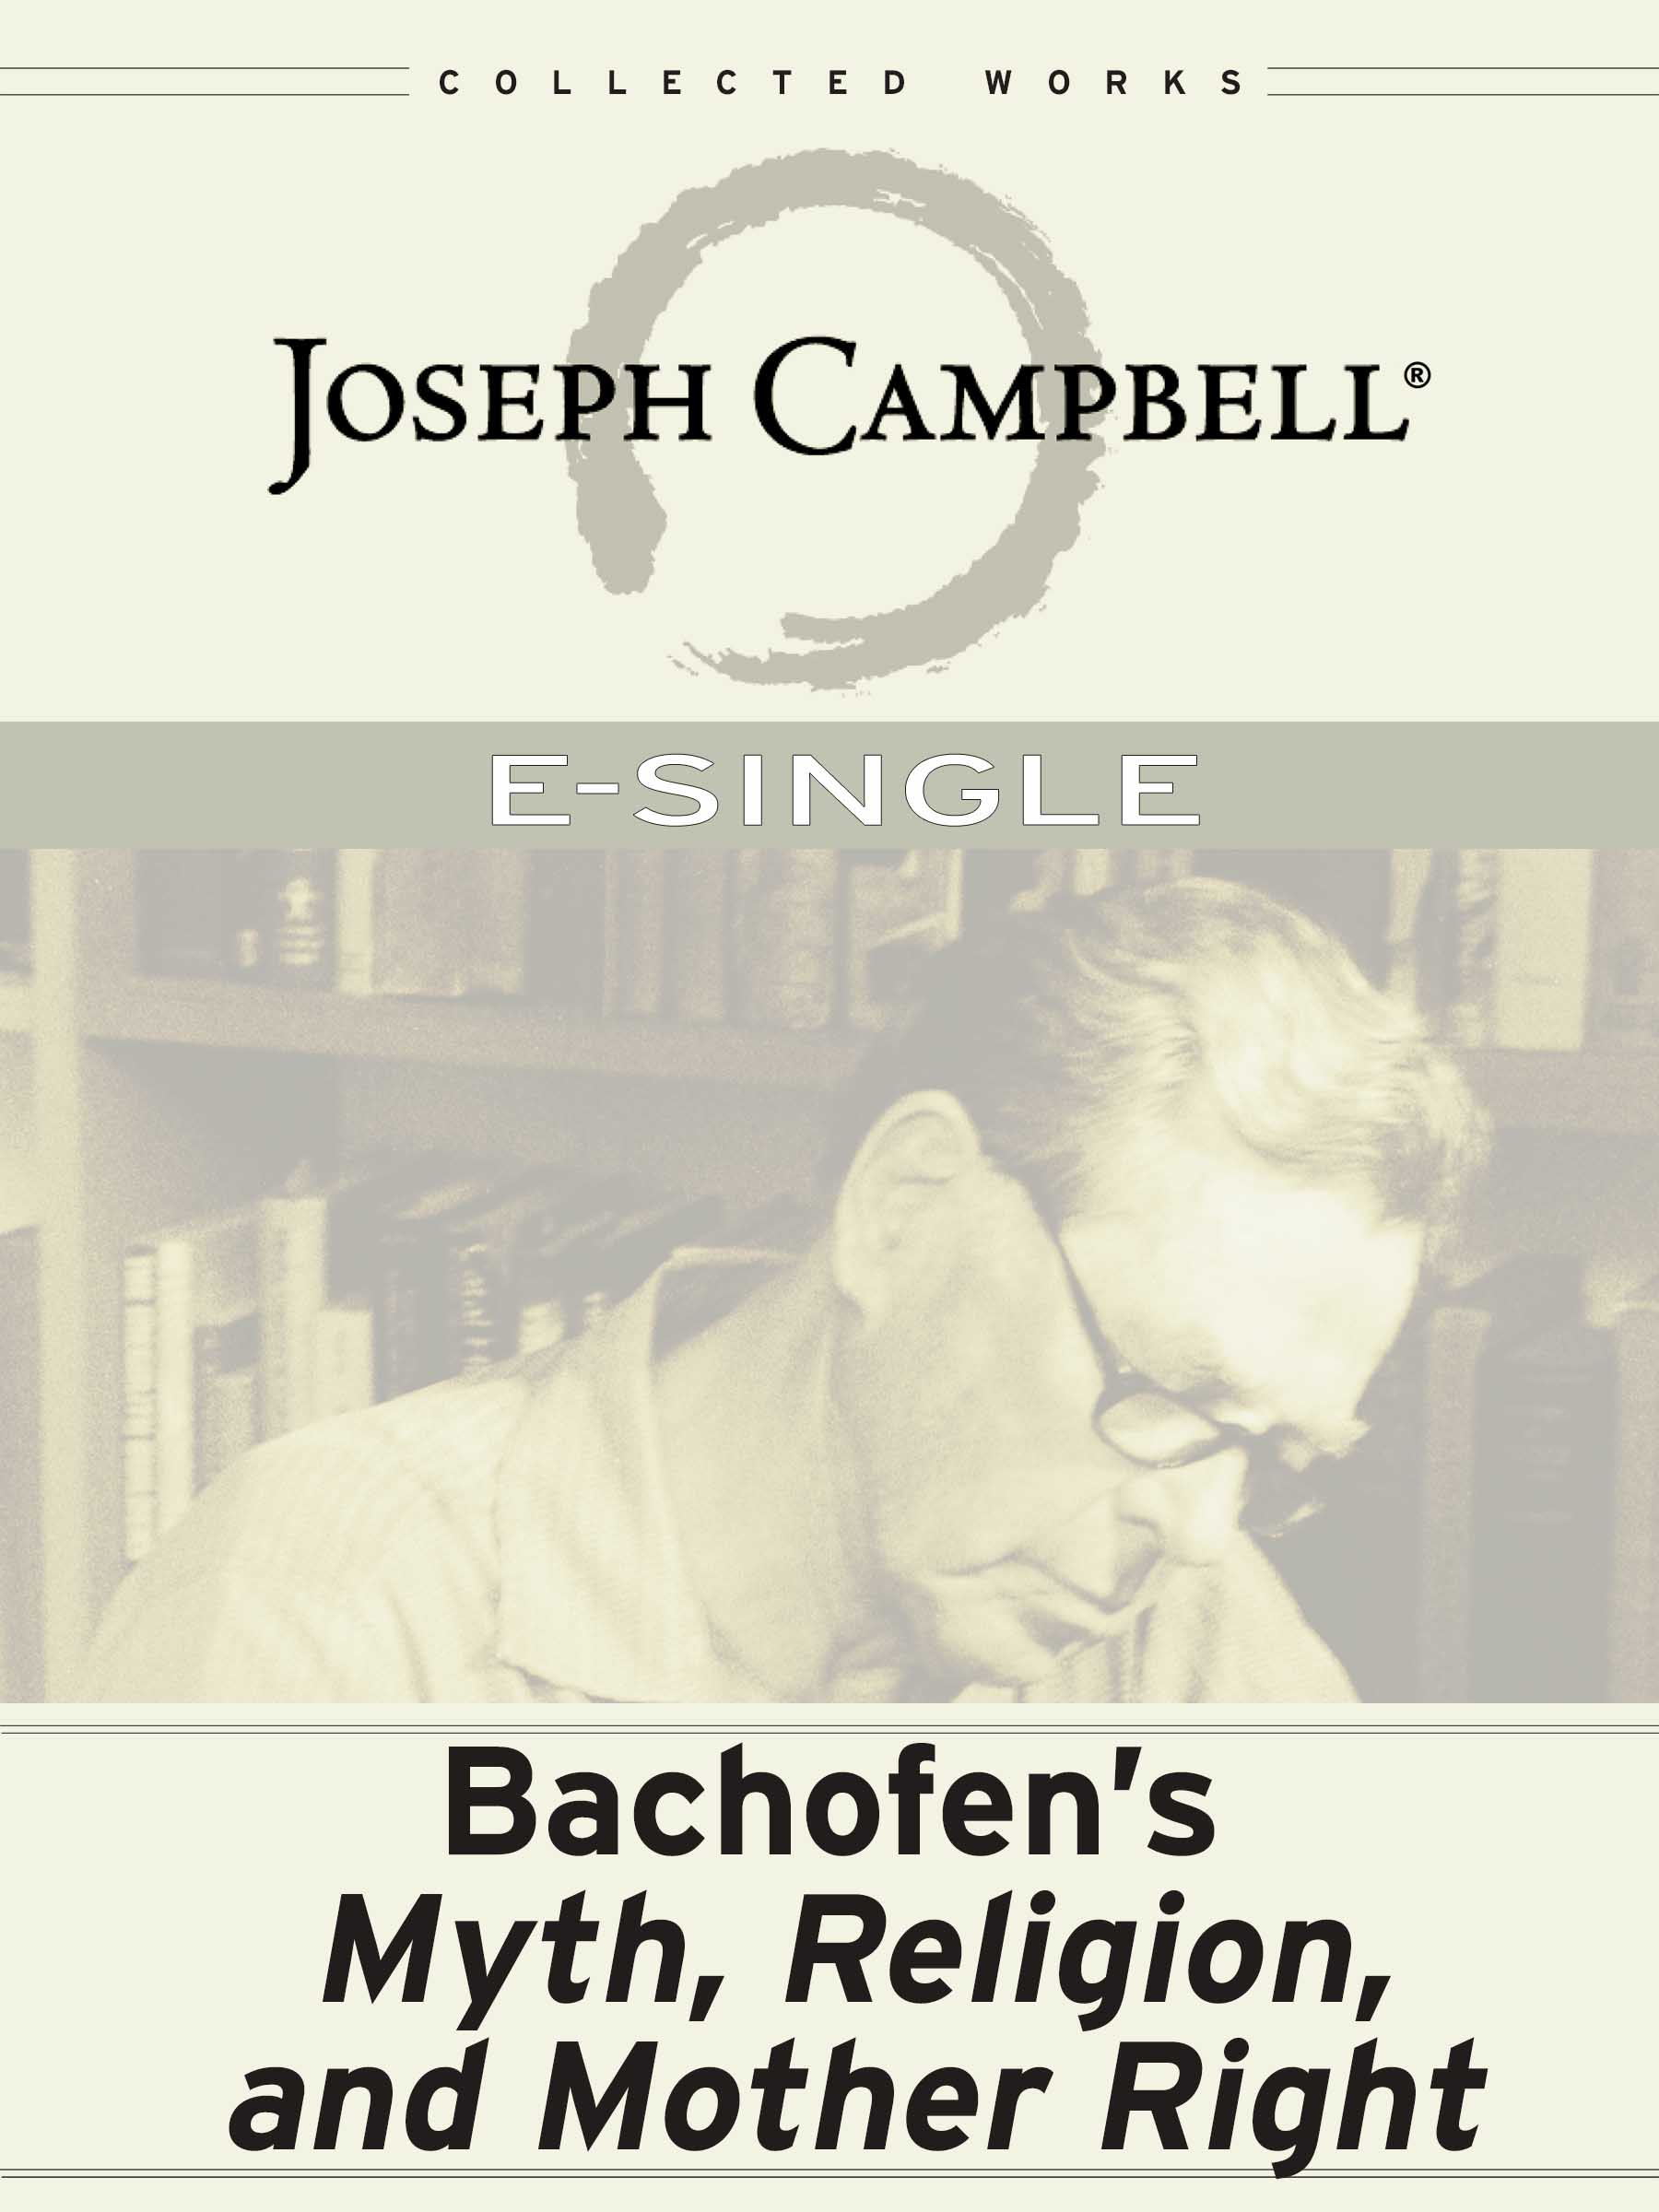 Bachofen's Myth, Religion & Mother Right (Esingle)